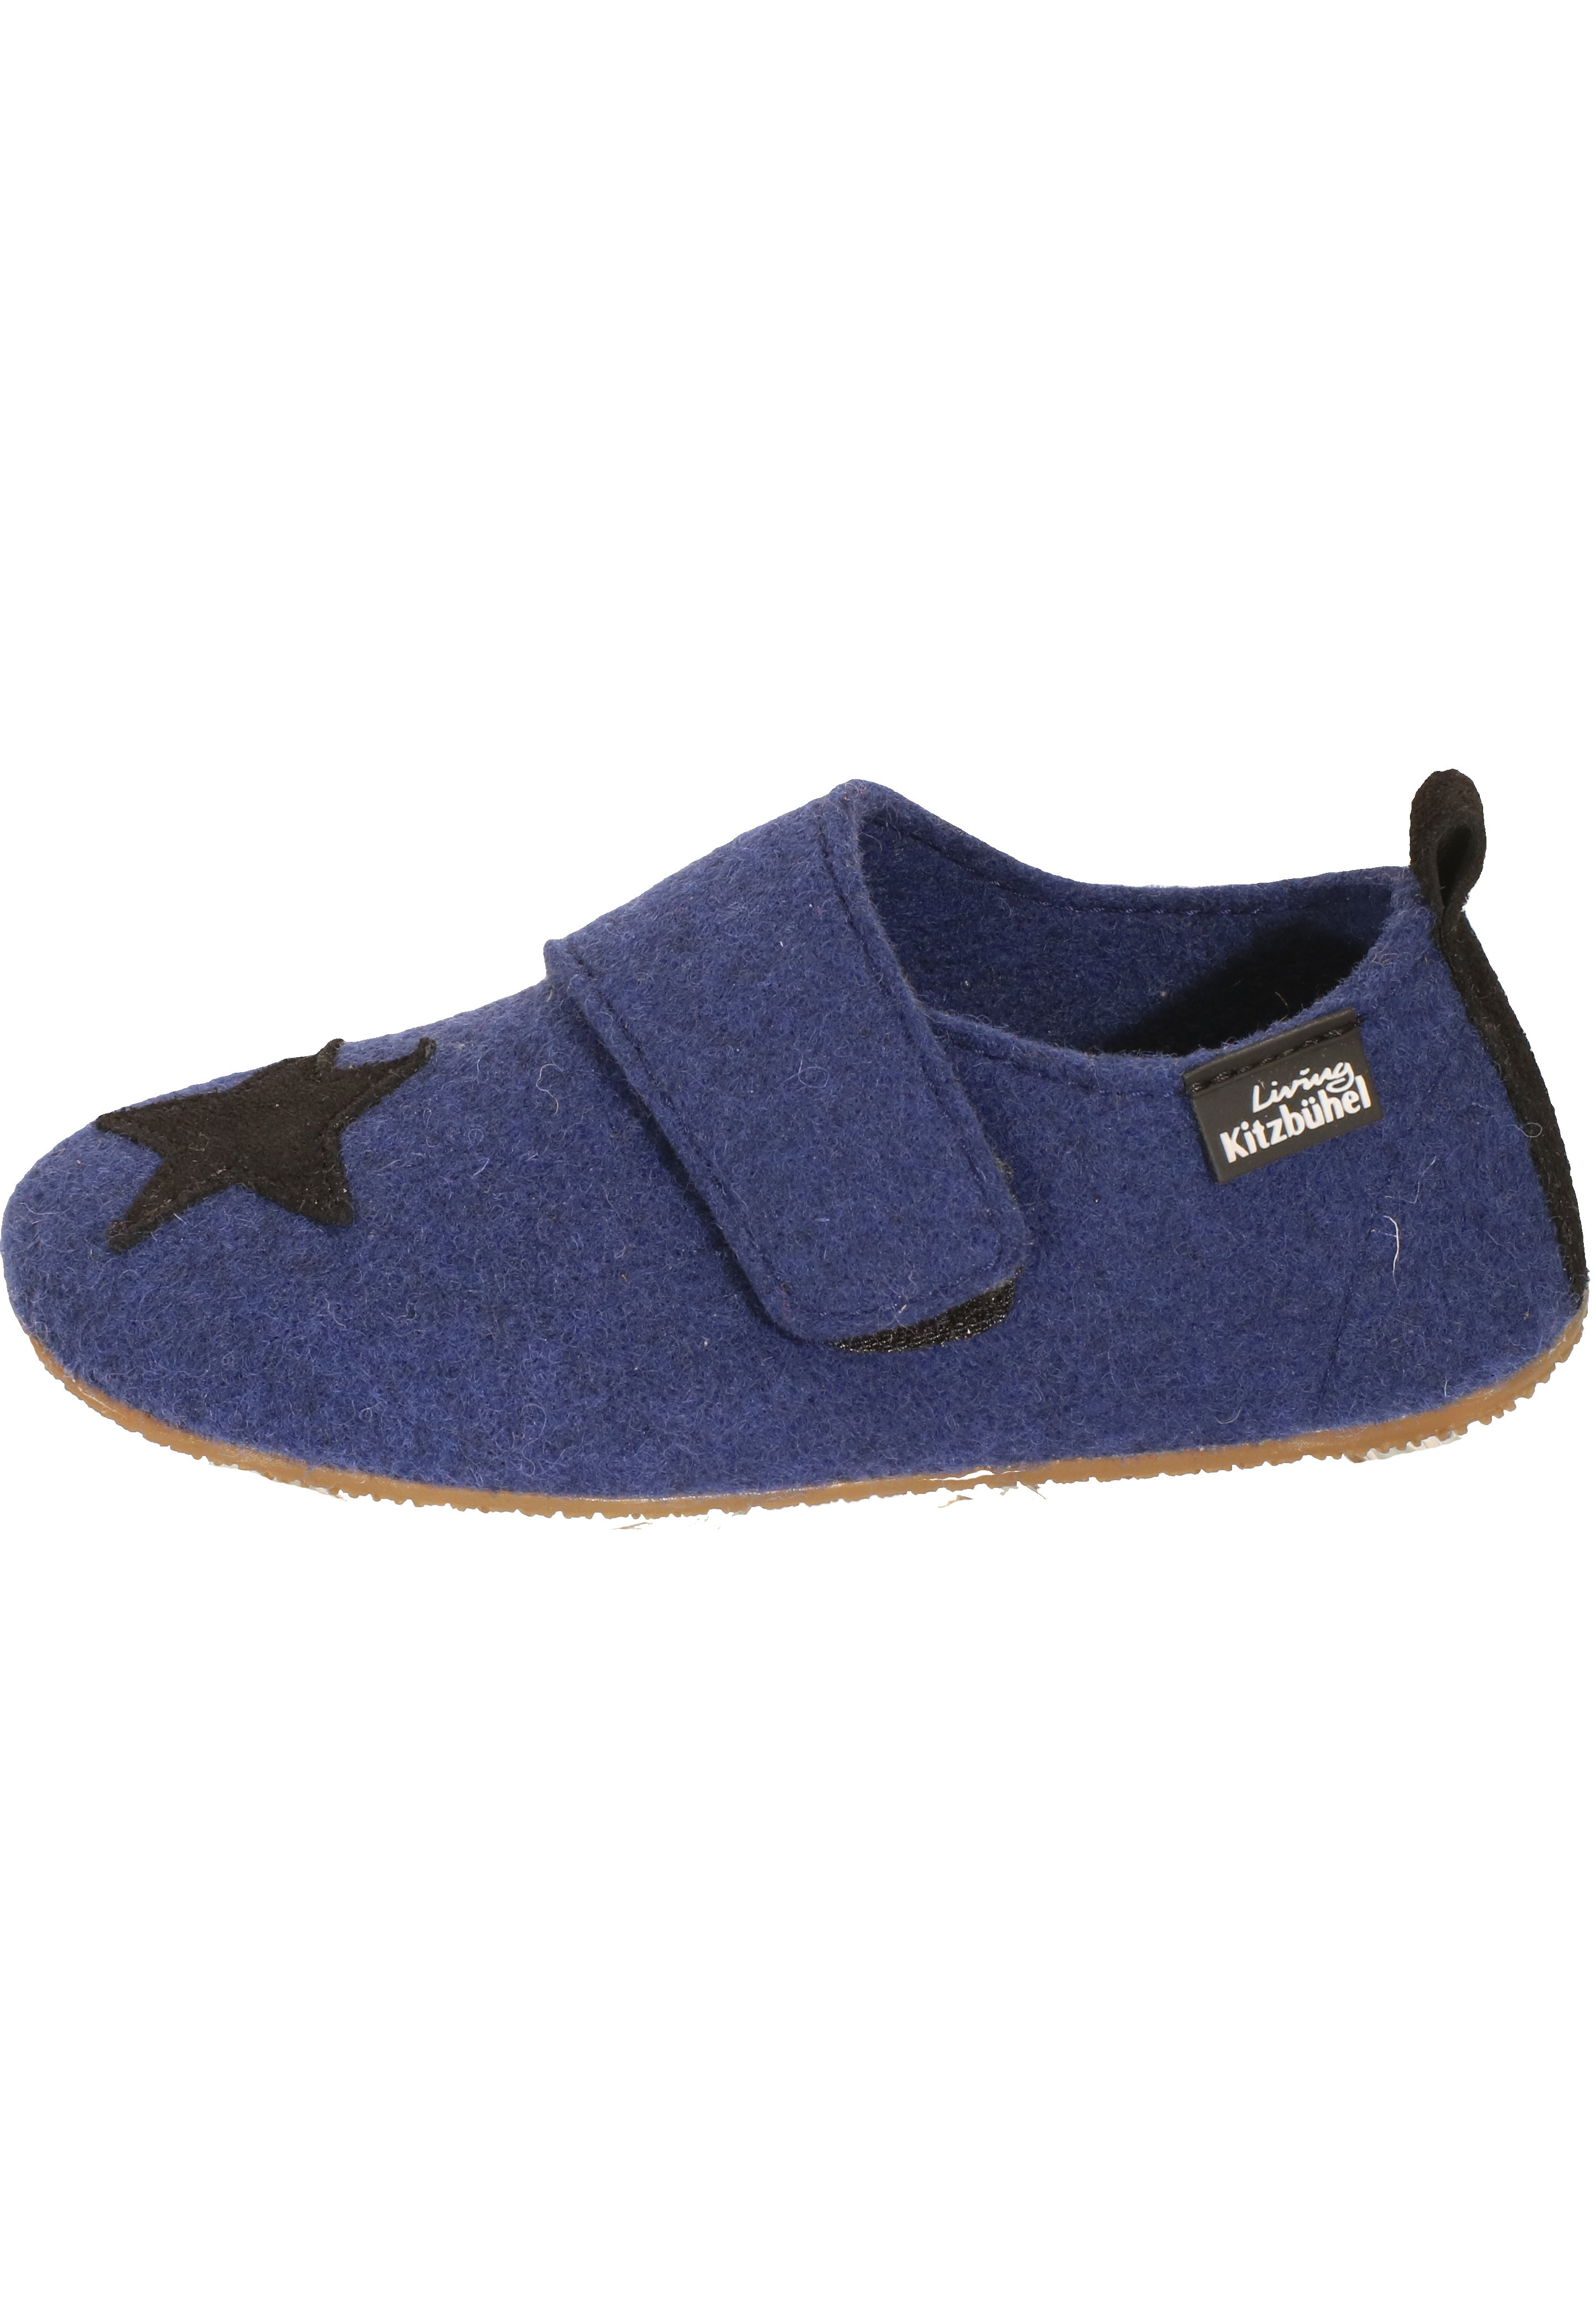 Børn KLETTMODELL FILZ - Loafers